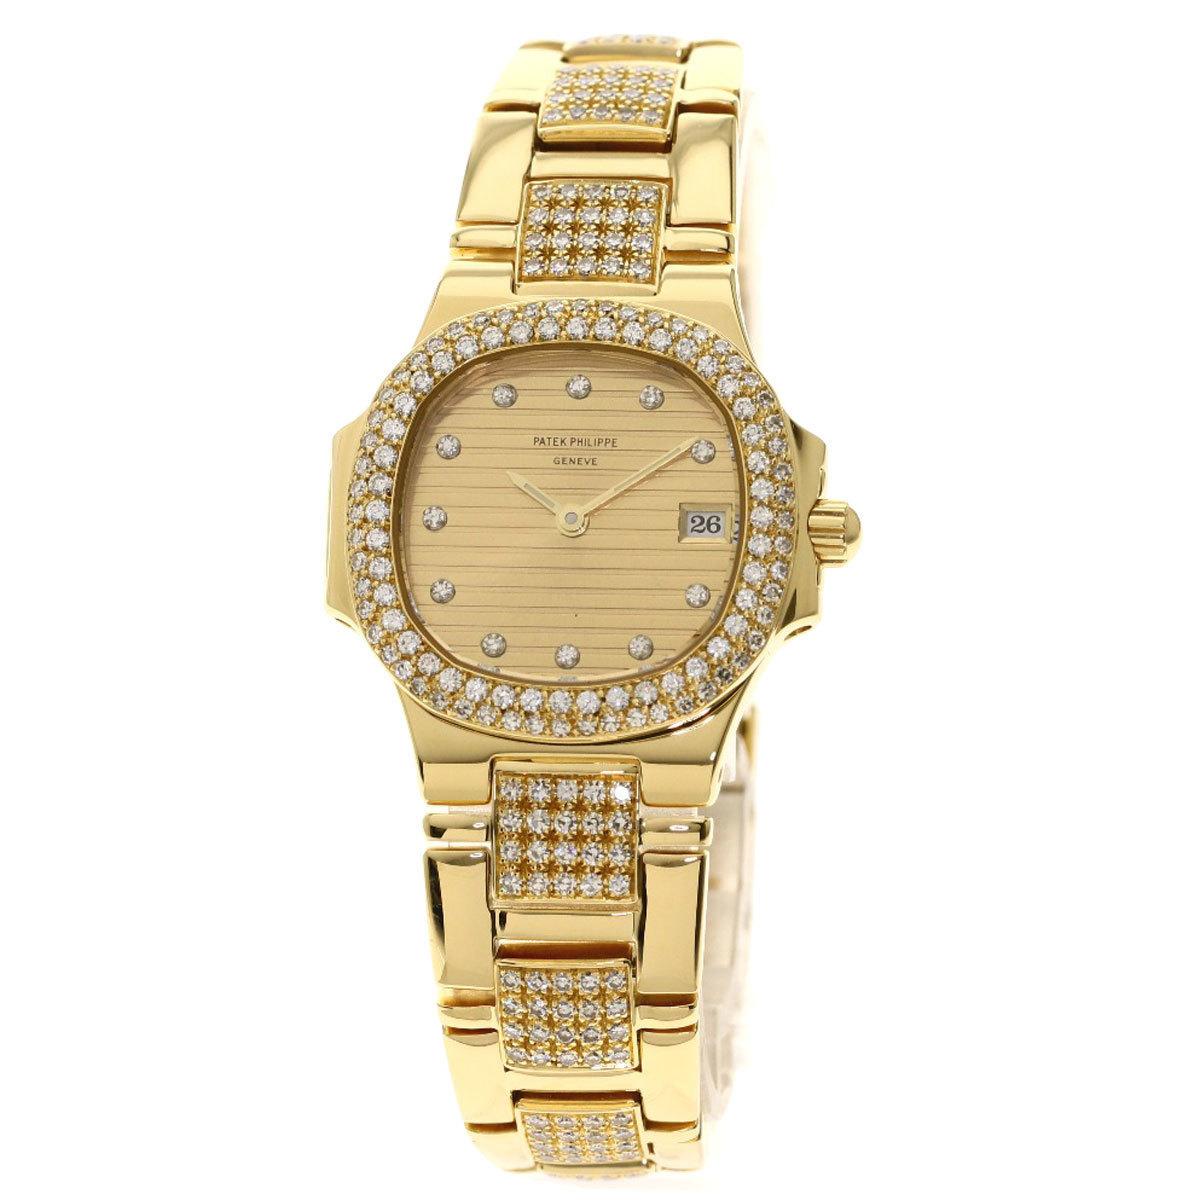 Patek Philippe 4700 55J-011 Nautilus Diamond Maker Complete Watch K18 Yellow Gold K18YG Ladies